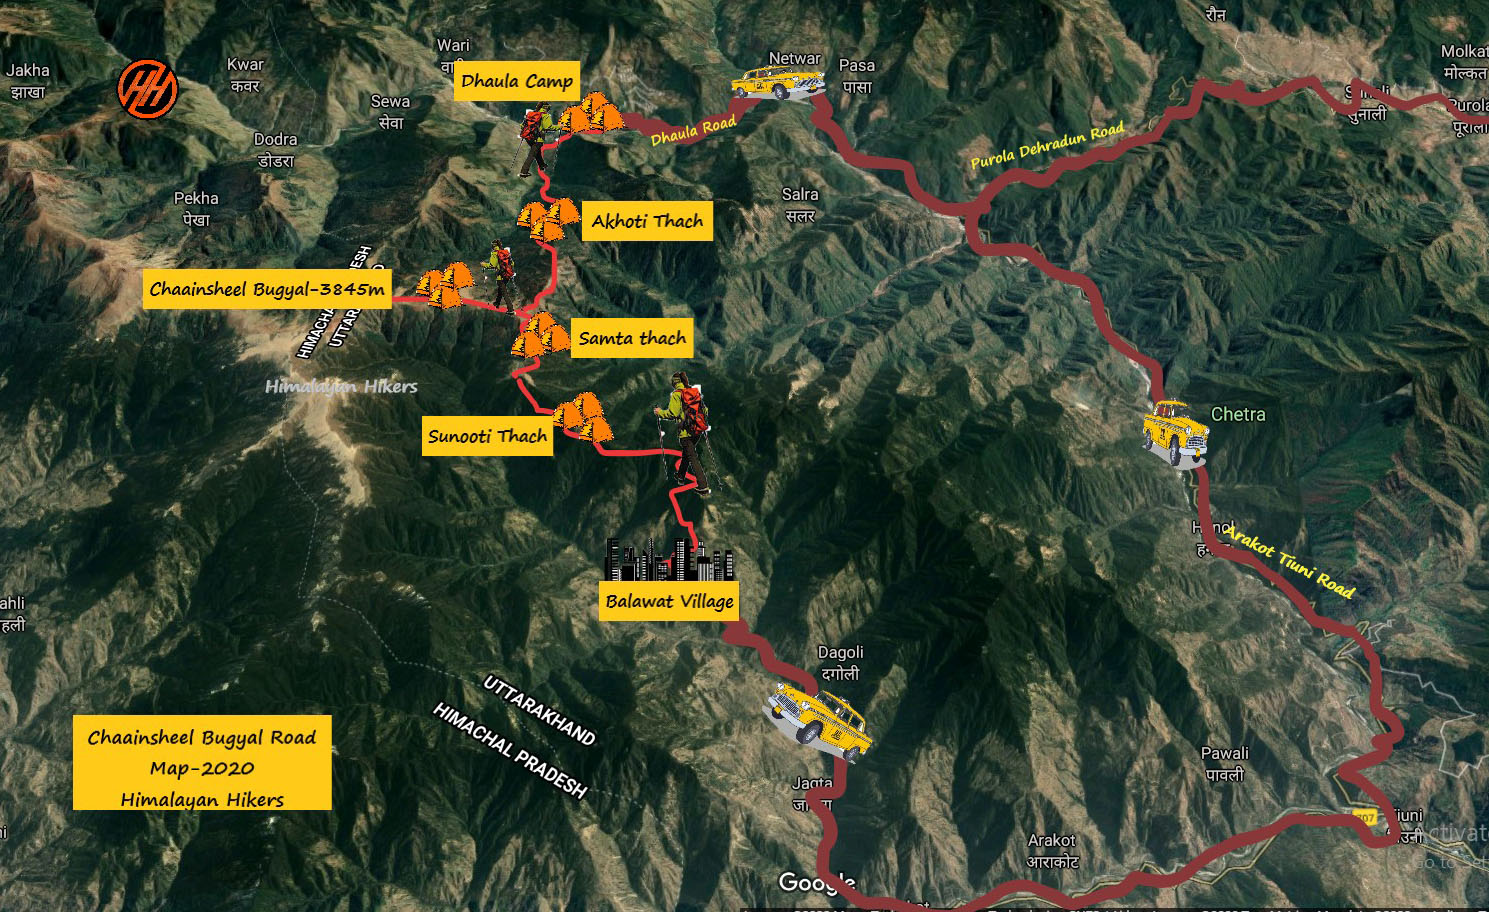 Chaainsheel Bugyal Trek Route map